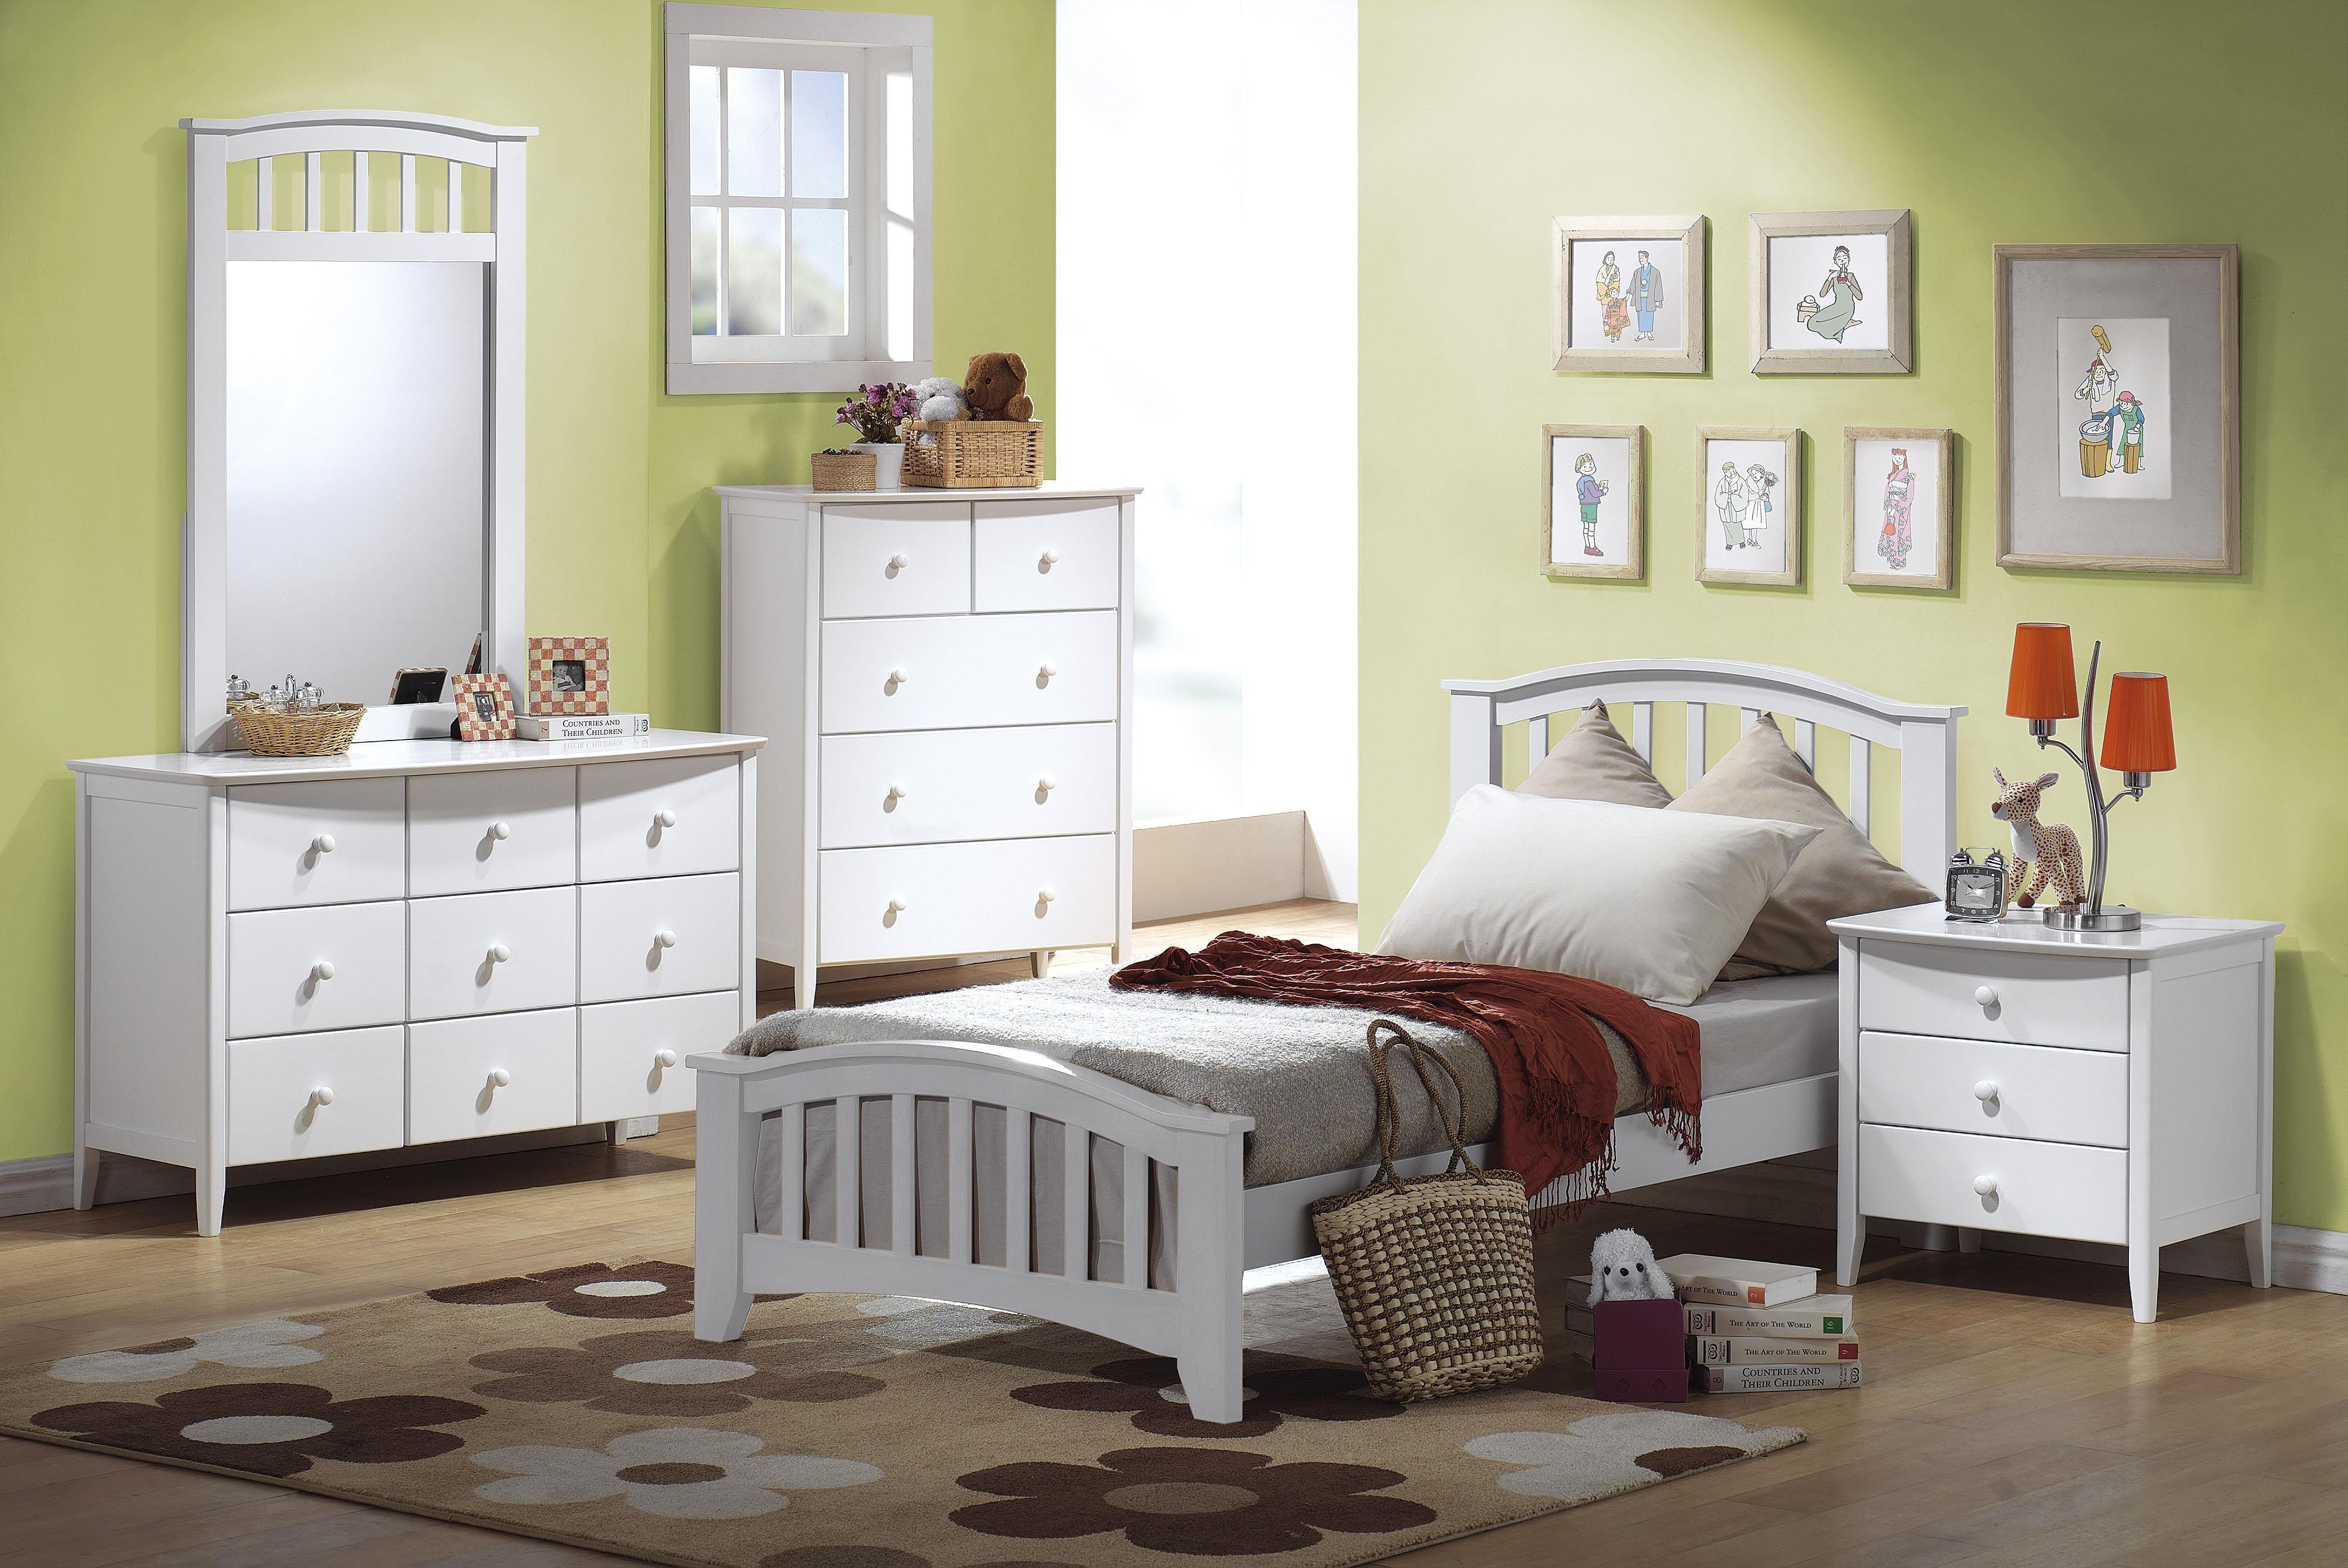 teenage white bedroom furniture. Beautiful Bright White Bedroom Furniture For Your Teen Or Tween! #teen # #bright Teenage